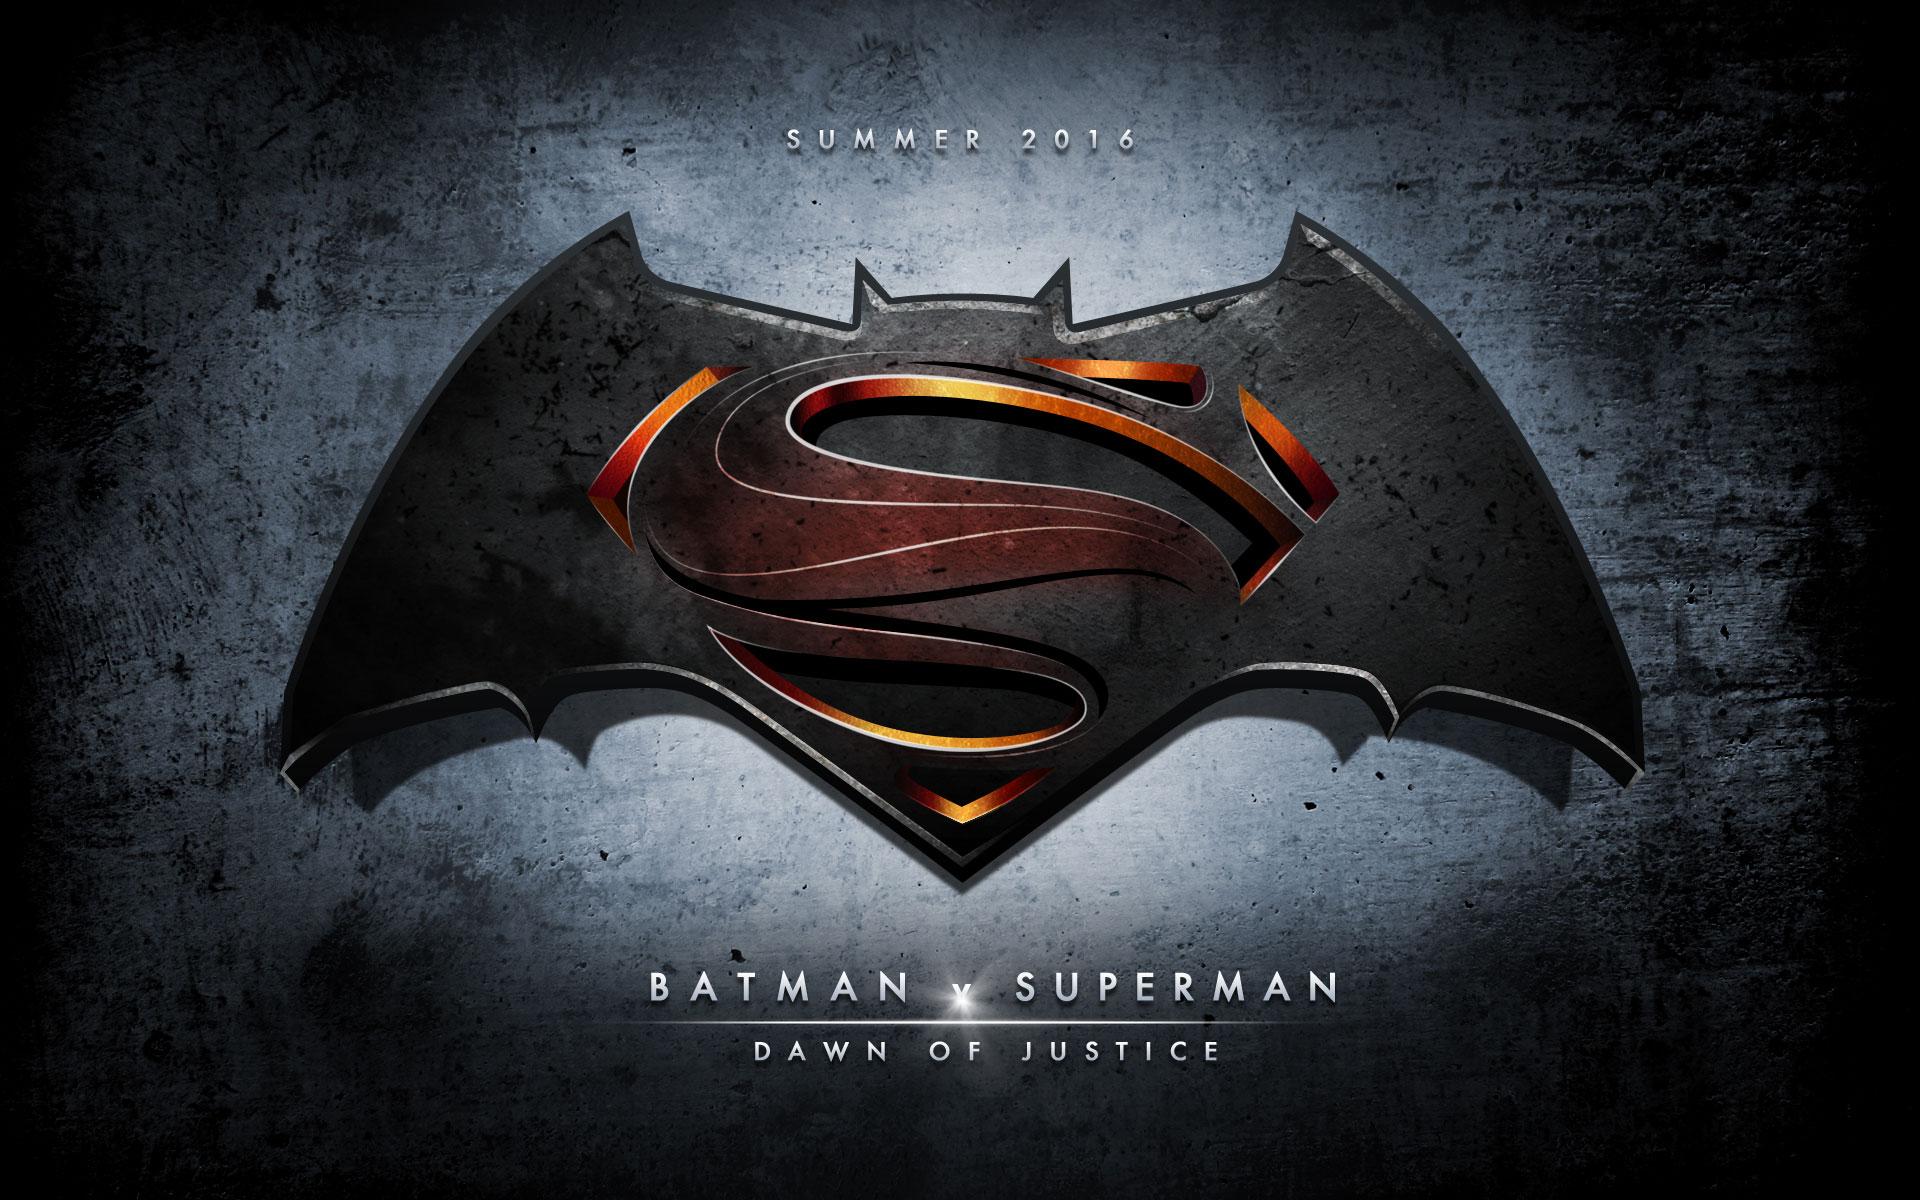 Nice wallpapers Batman VS. Superman 1920x1200px